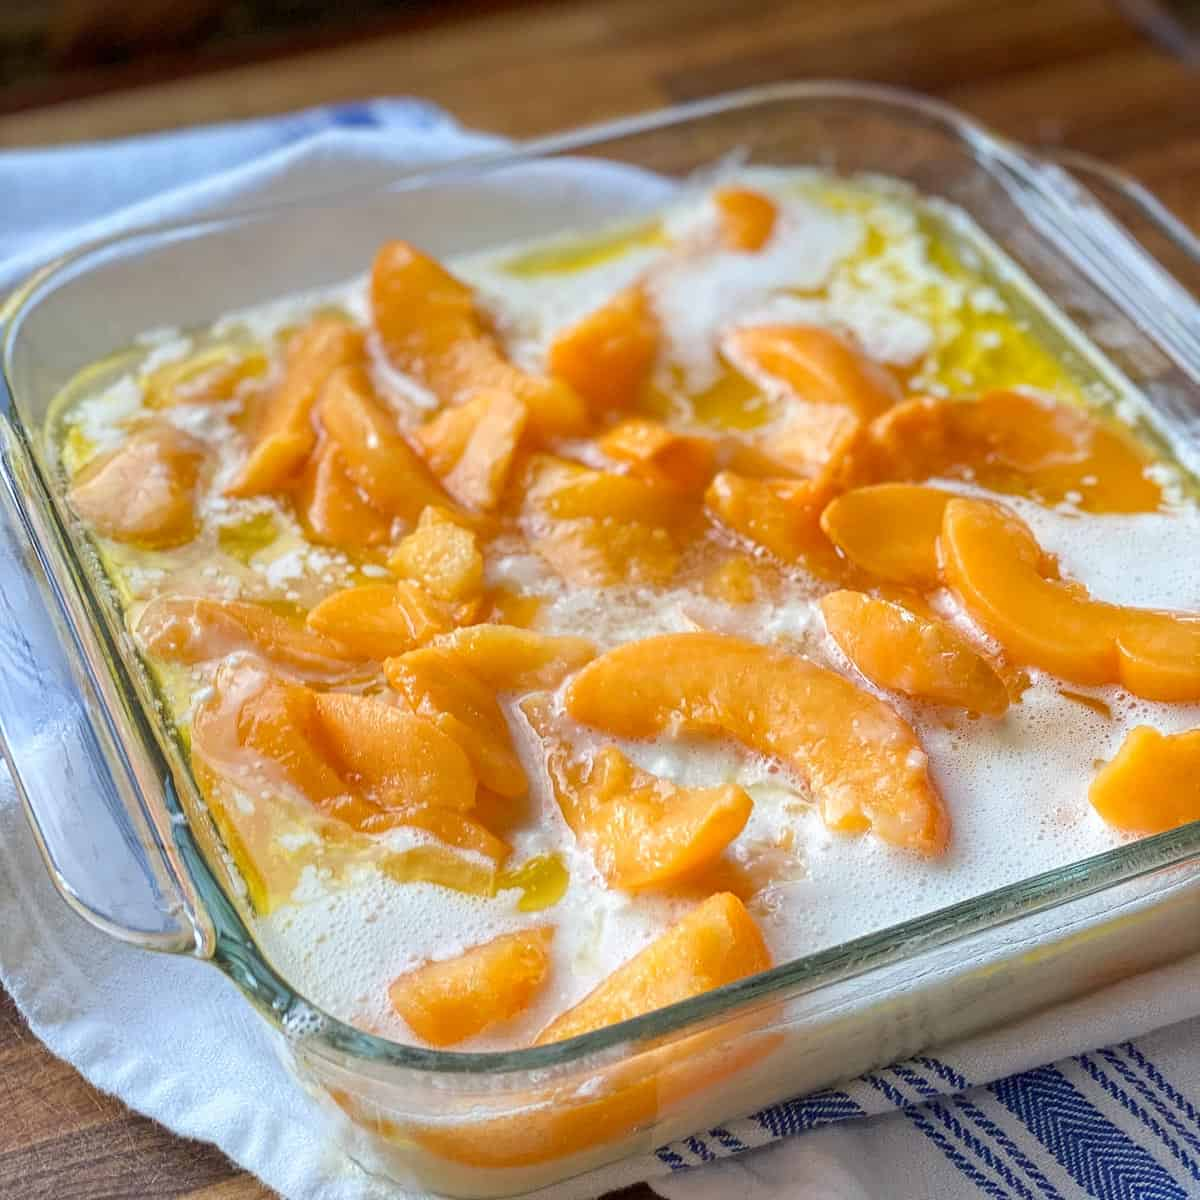 Easy Peach Cobbler Recipe ready for the oven.